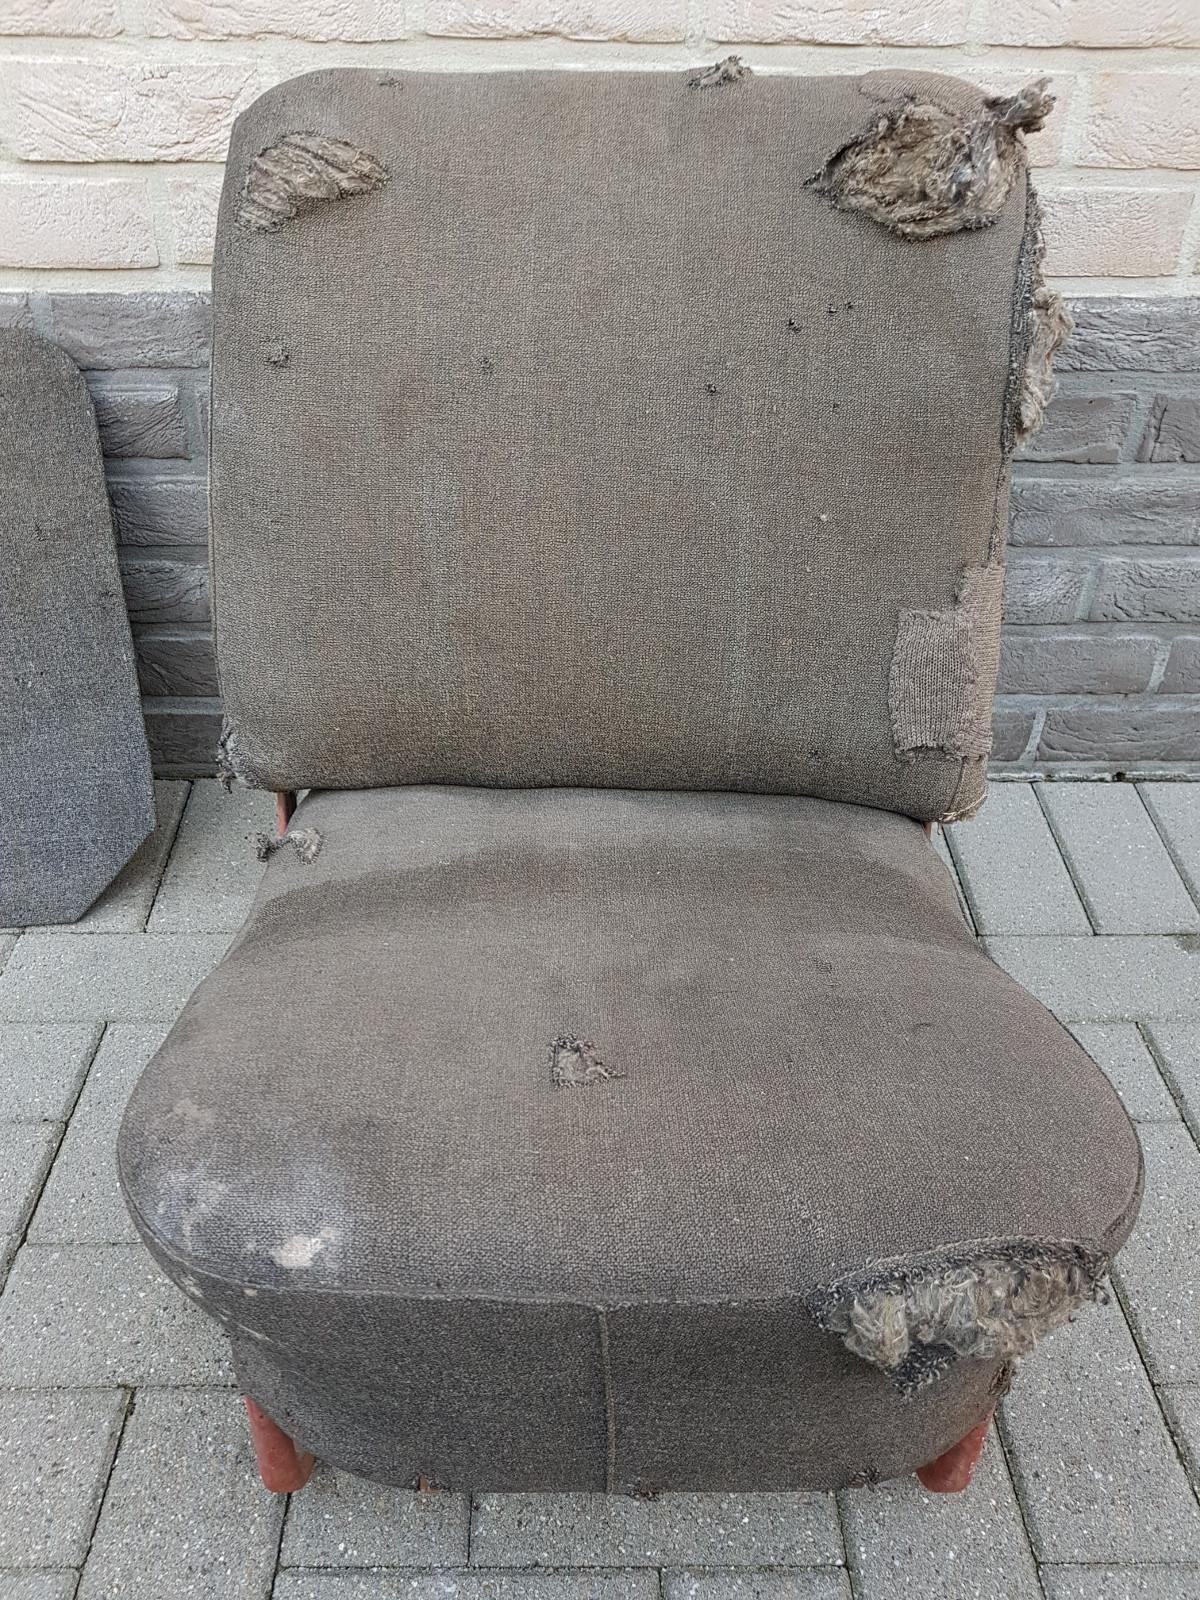 1949 Upholstery